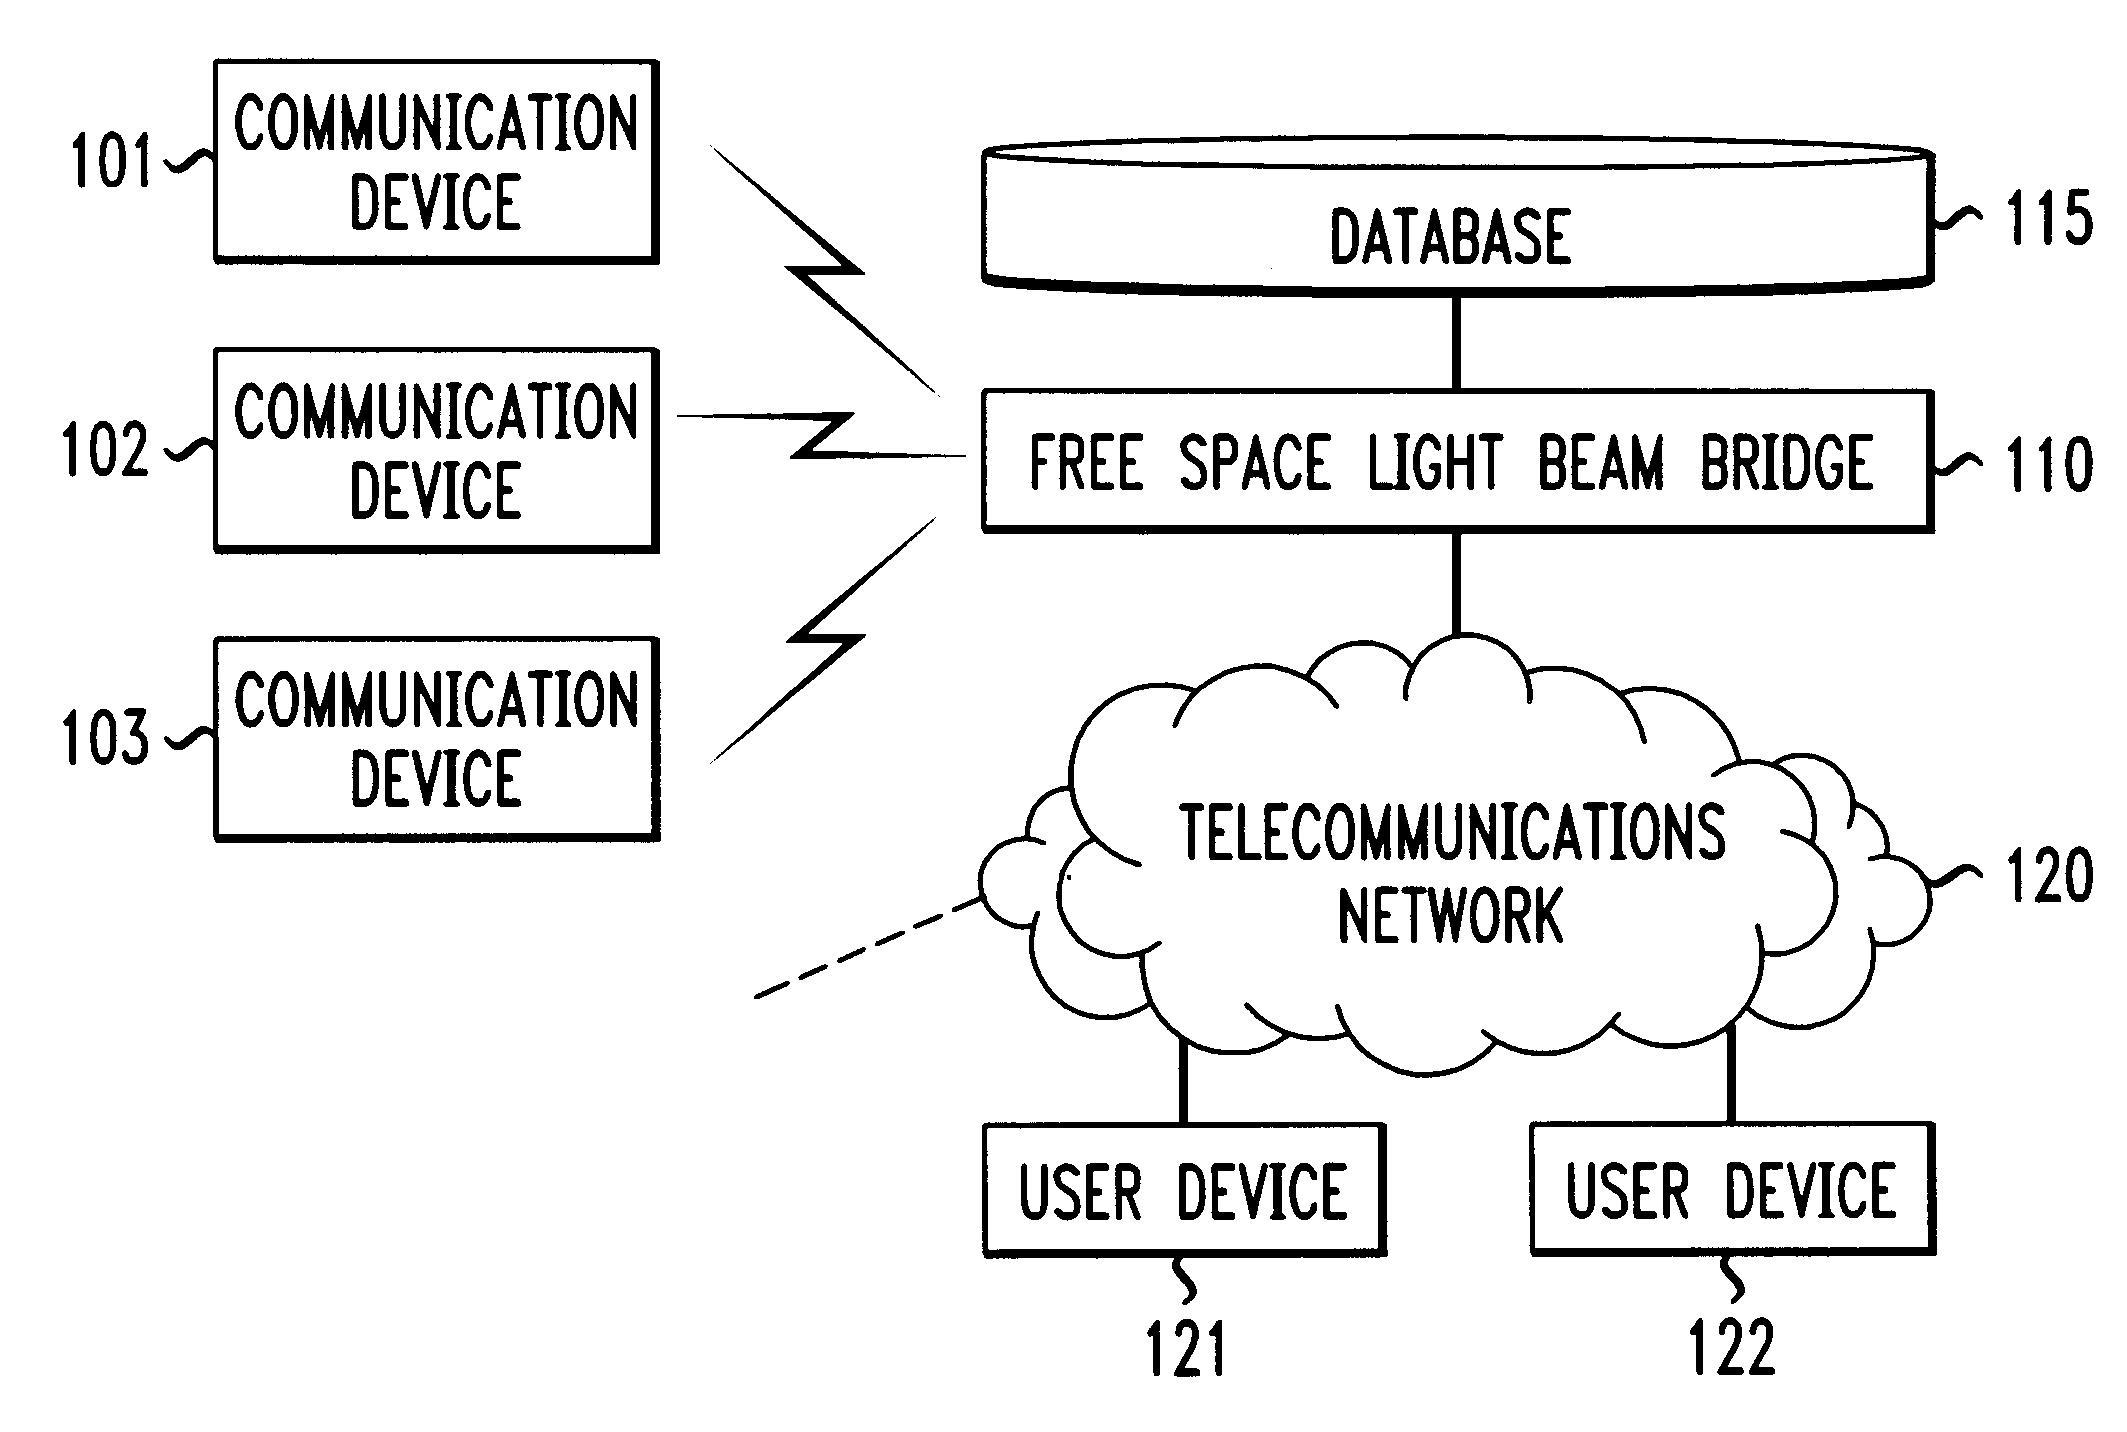 Us6417947 Free Space Light Multibeam Network Bridge Beam Diagram Patent Drawing